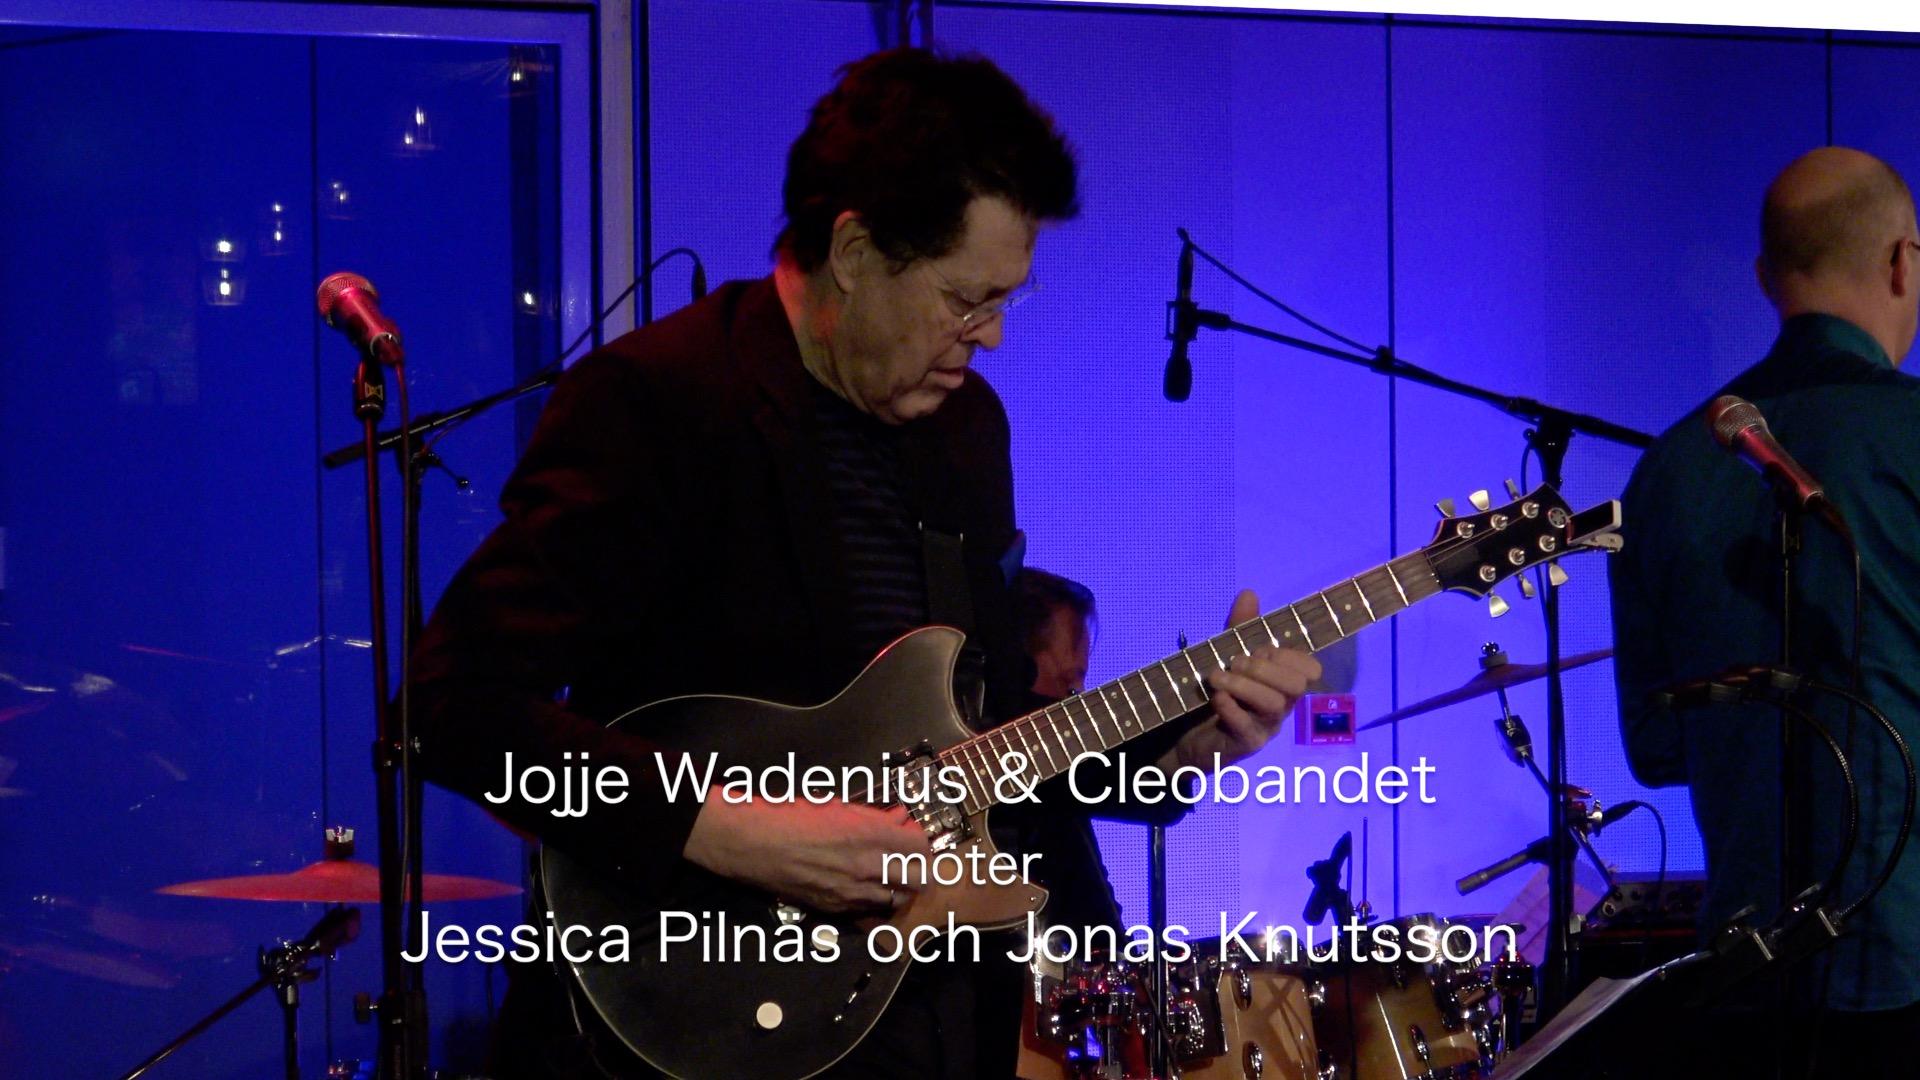 Jojje Wadenius & Cleobandet meets Jessica Pilnäs and Jonas Knutsson